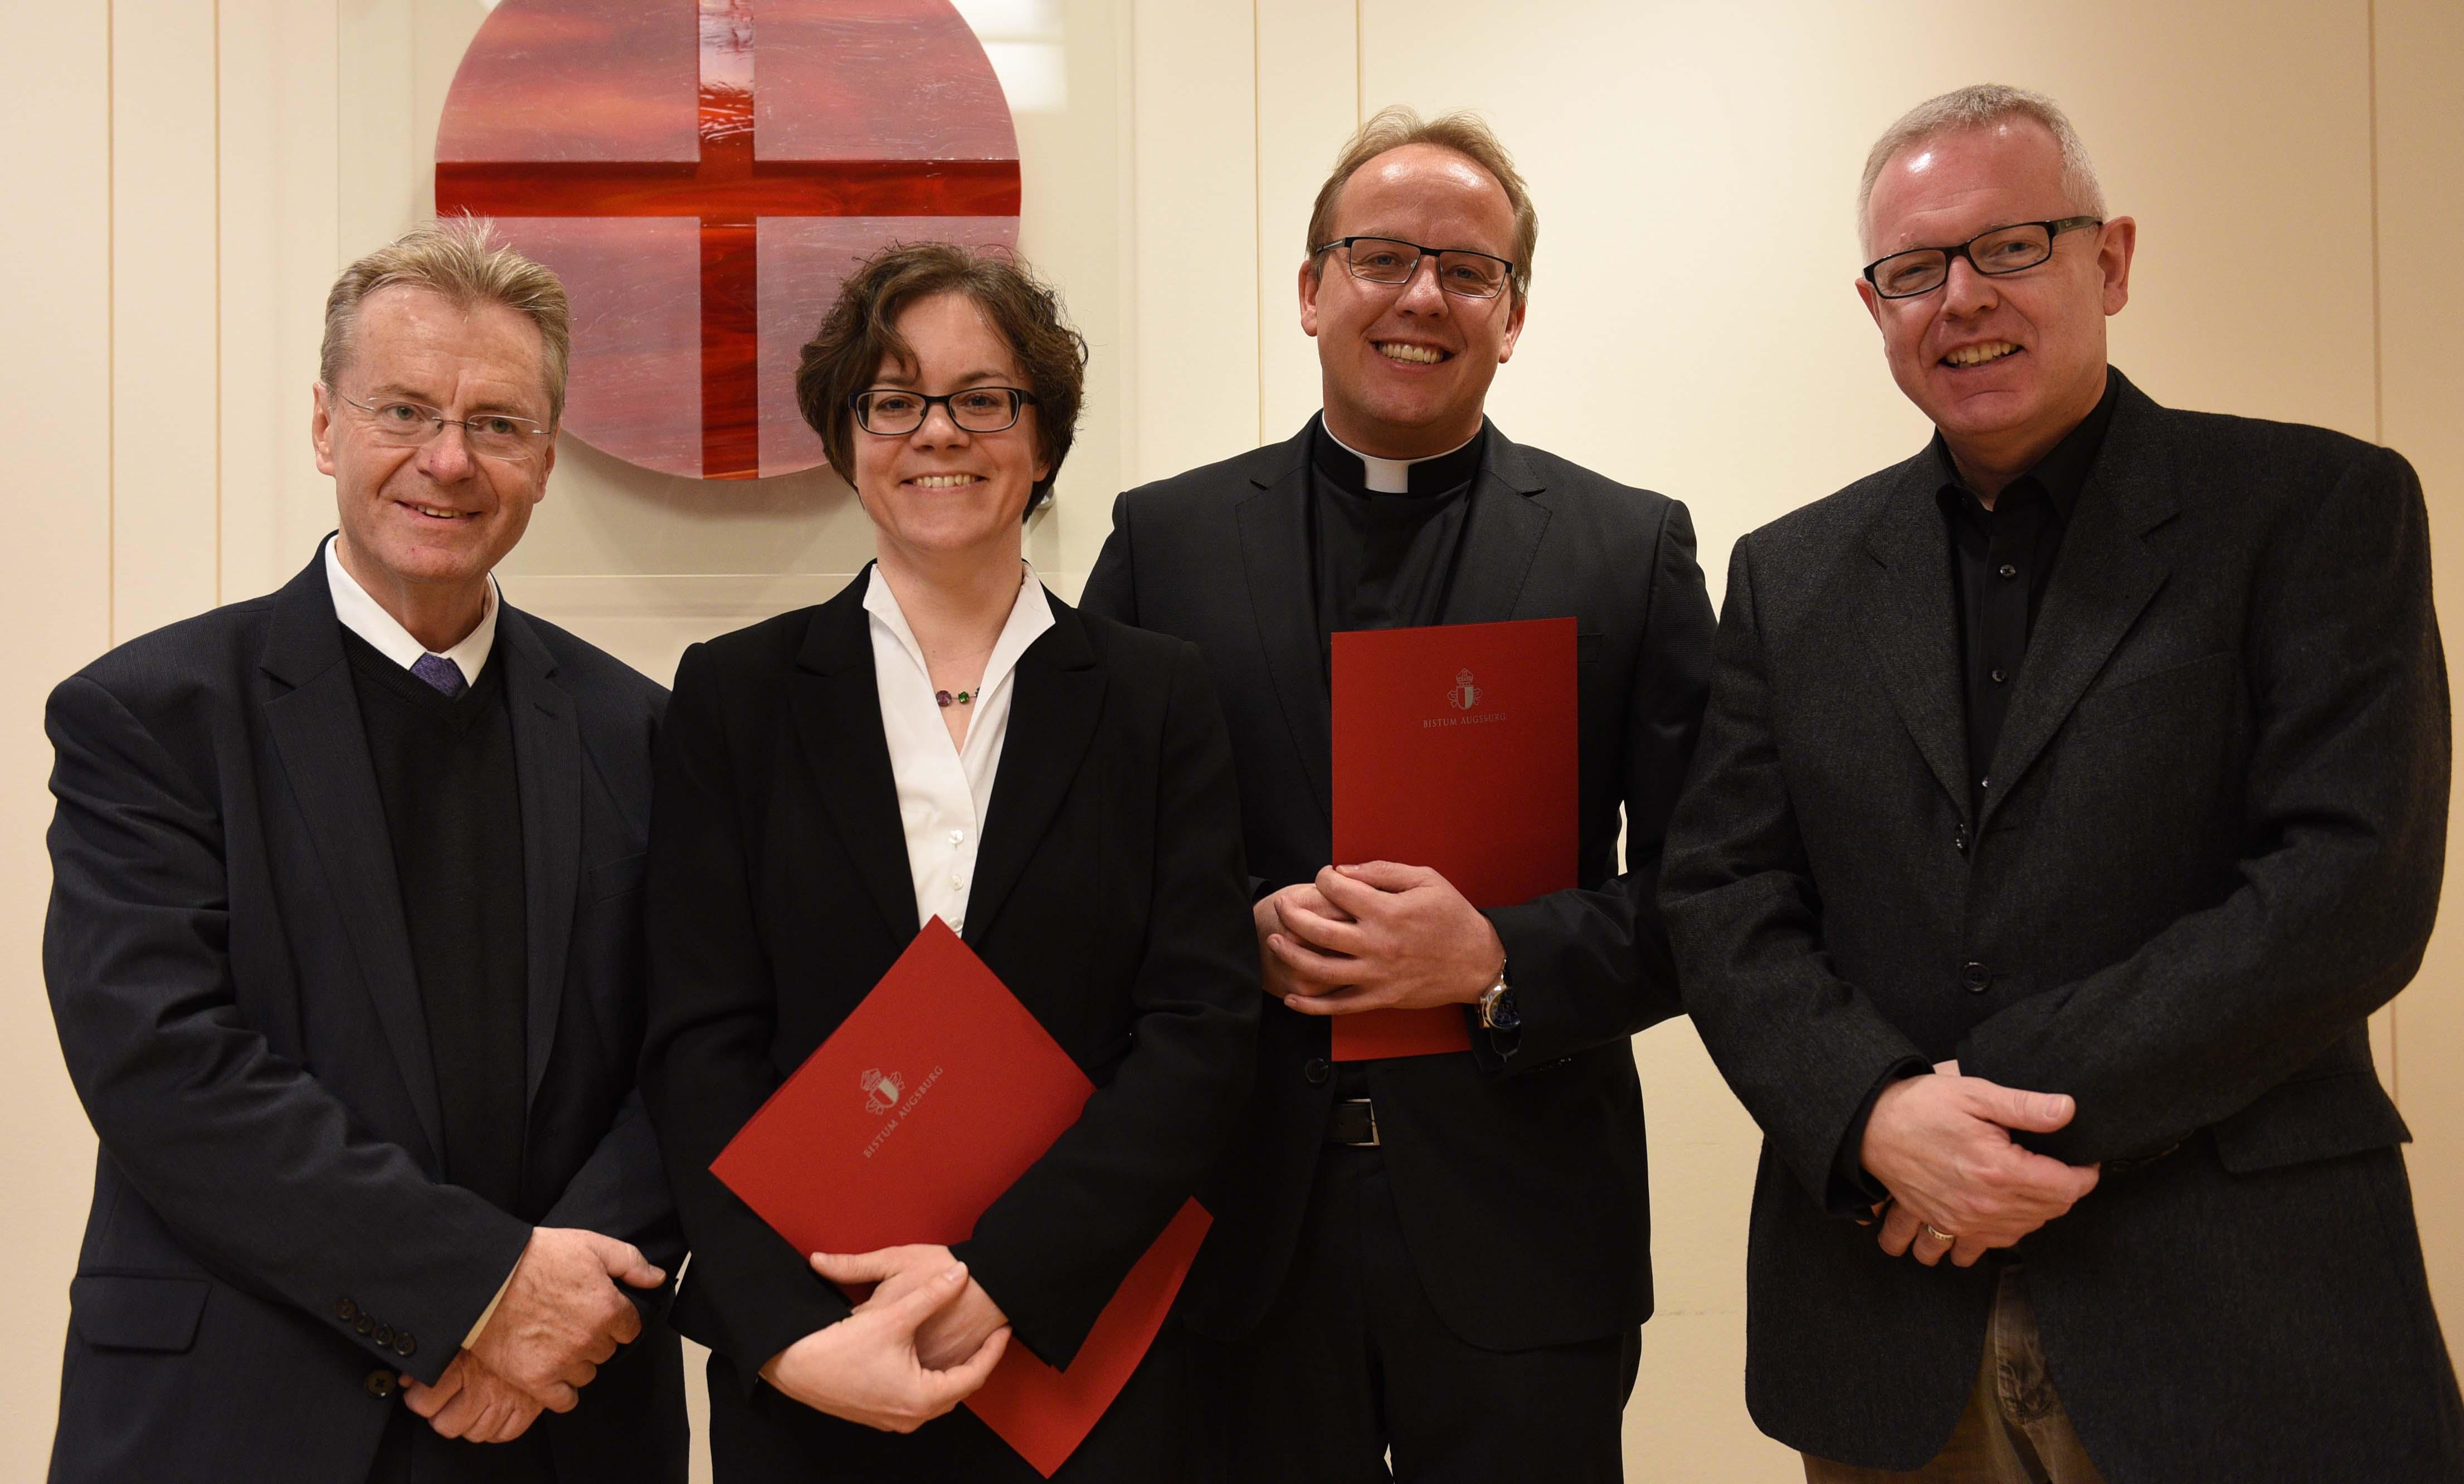 Die Preisträger mit ihren Doktorvätern (v.links): Prof. Dr. Franz Sedlmeier, Dr. Carolin Neuber, Dr. Andreas Jall, Prof. Dr. Peter Hofmann